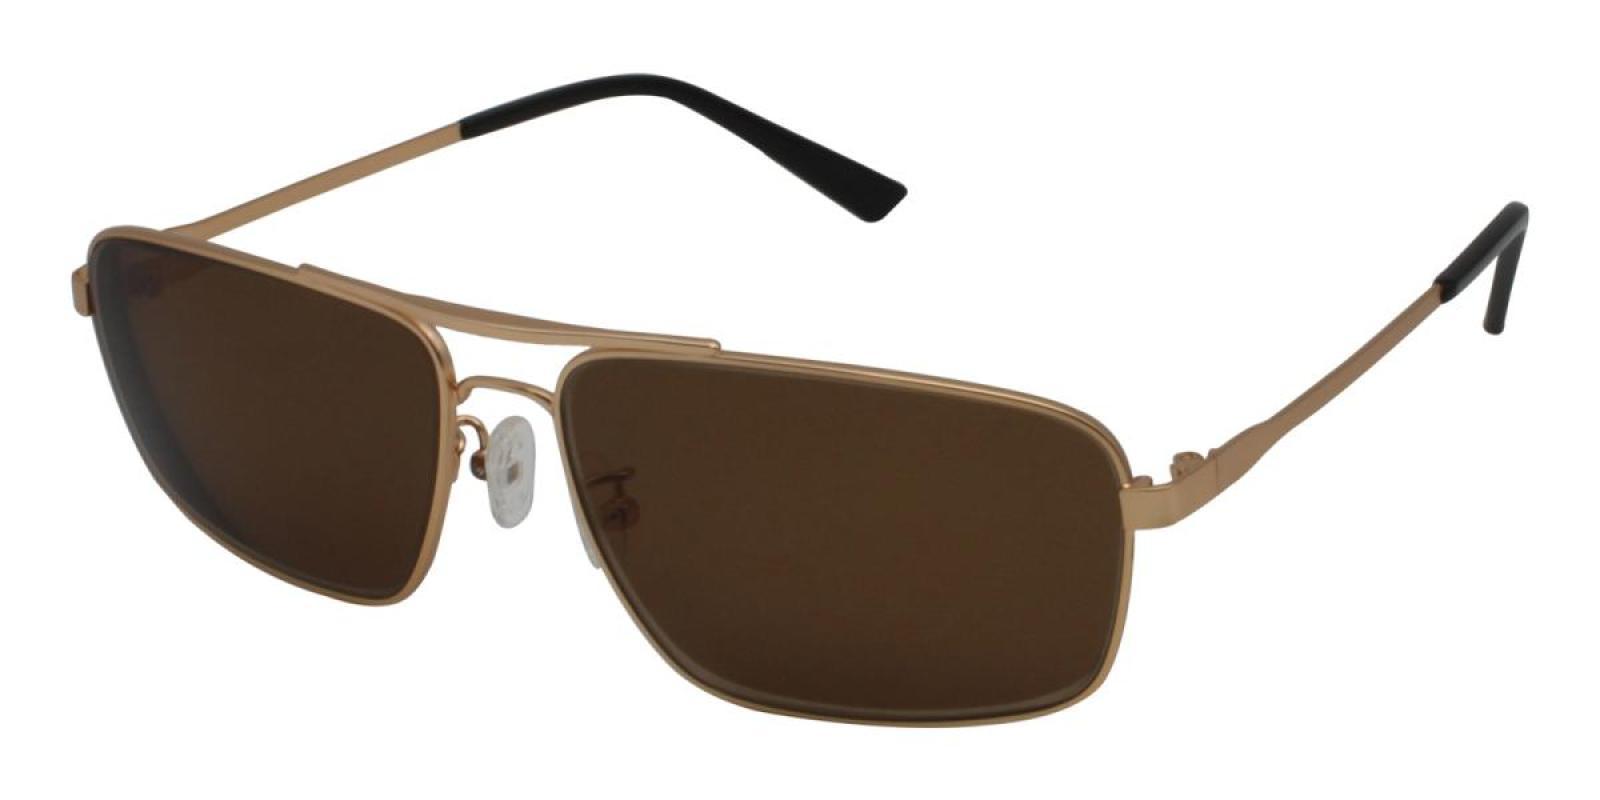 Santorini-Gold-Aviator-Metal-Sunglasses-additional1